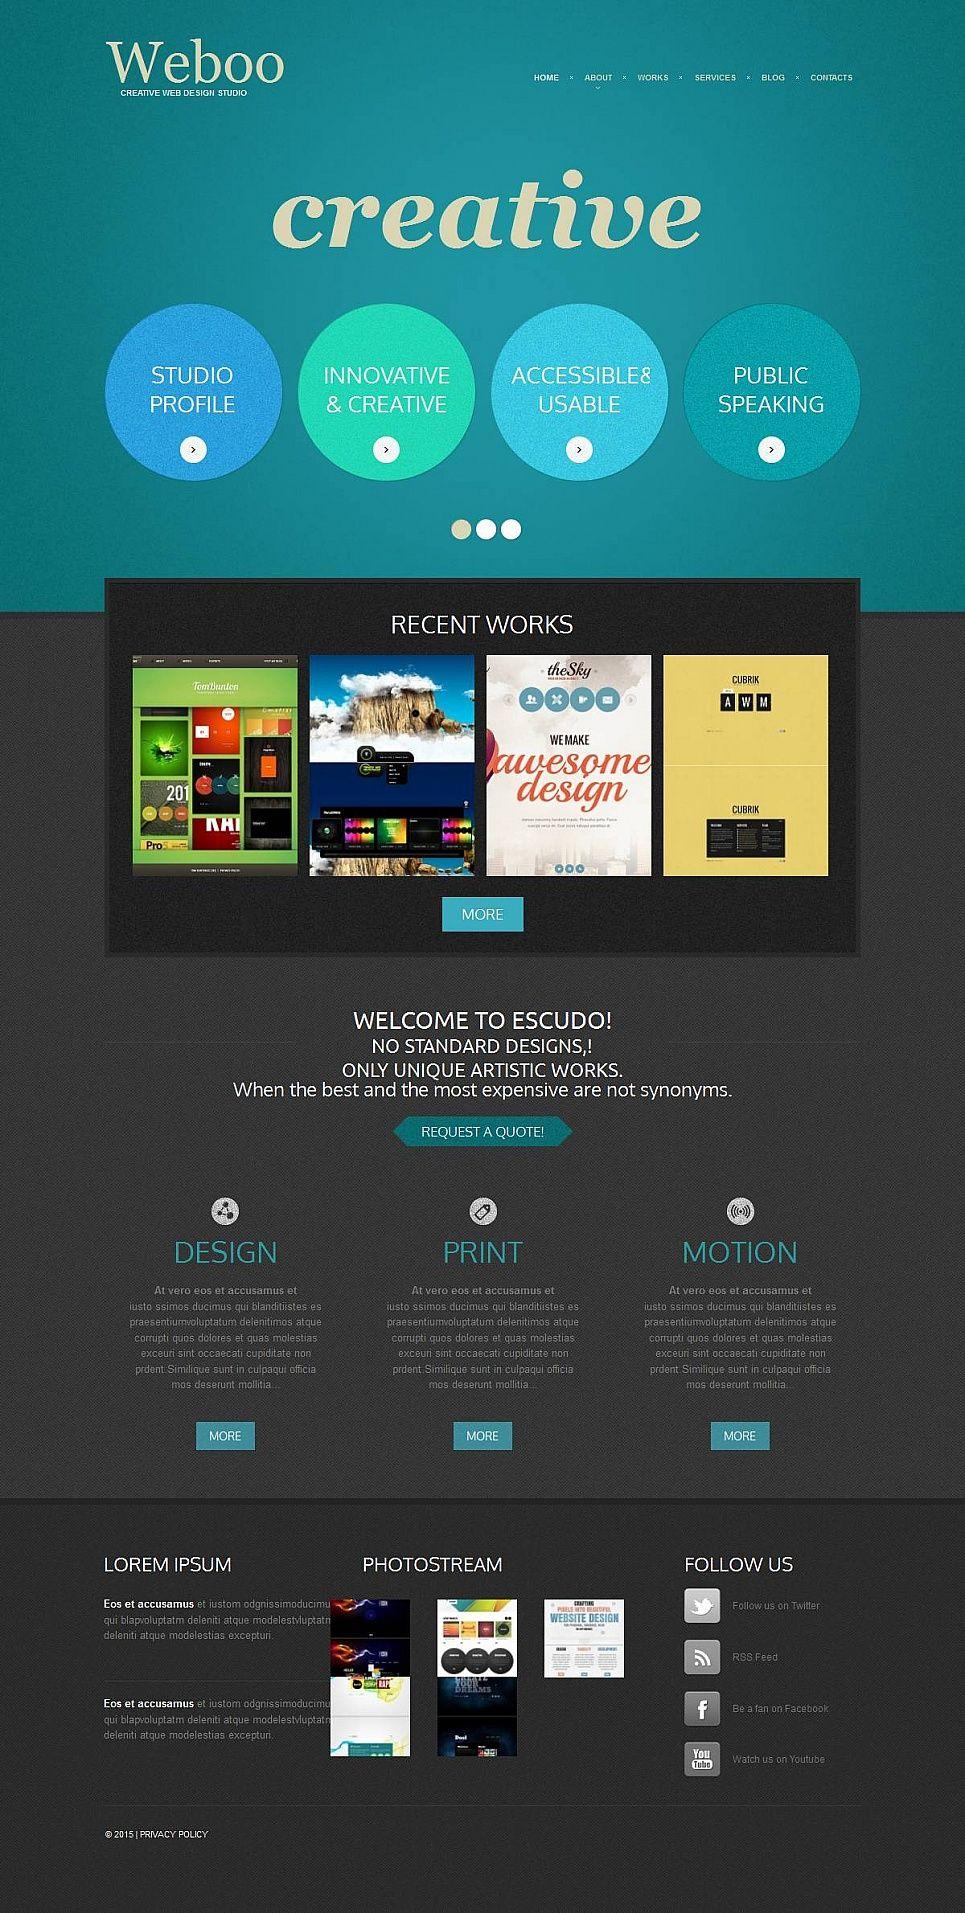 Web Design Moto Cms Html Template 53219 Web Design Wordpress Template Web Design Software